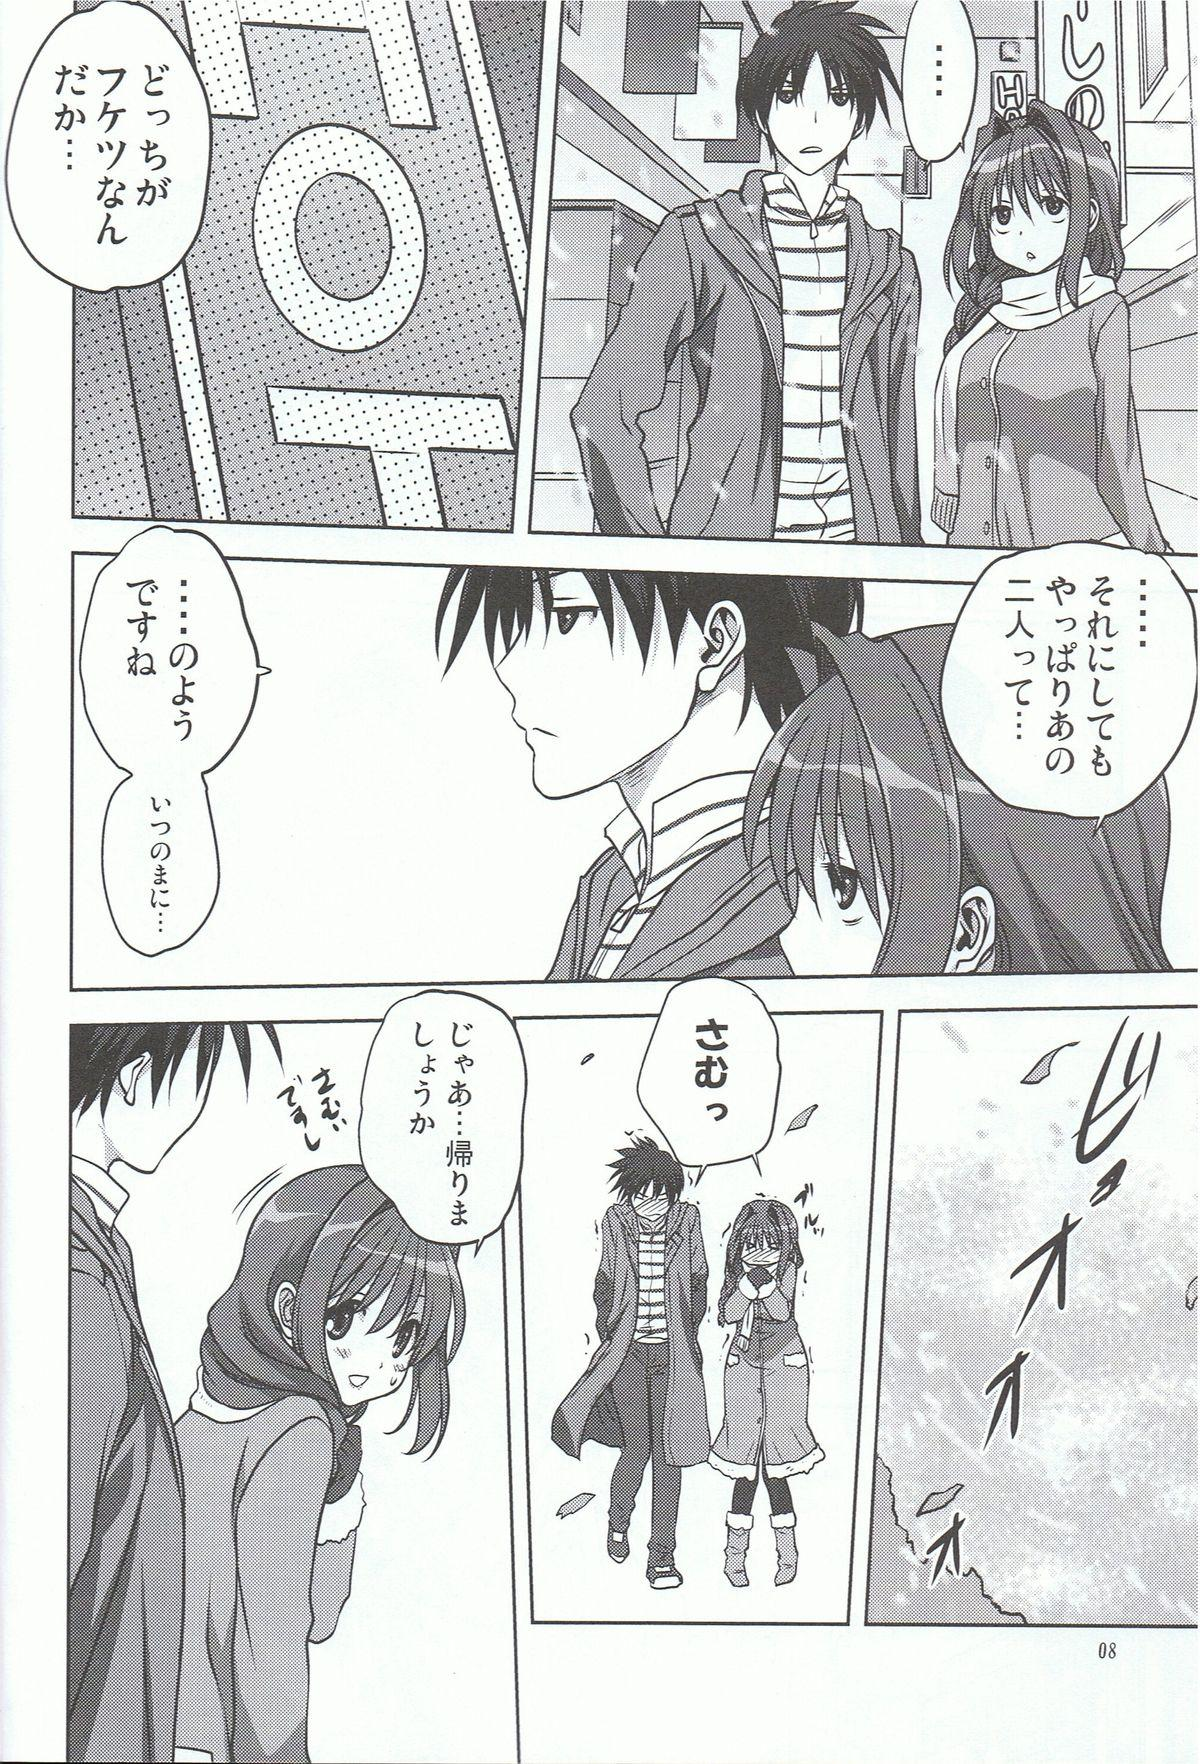 Akiko-san to Issho 13 6